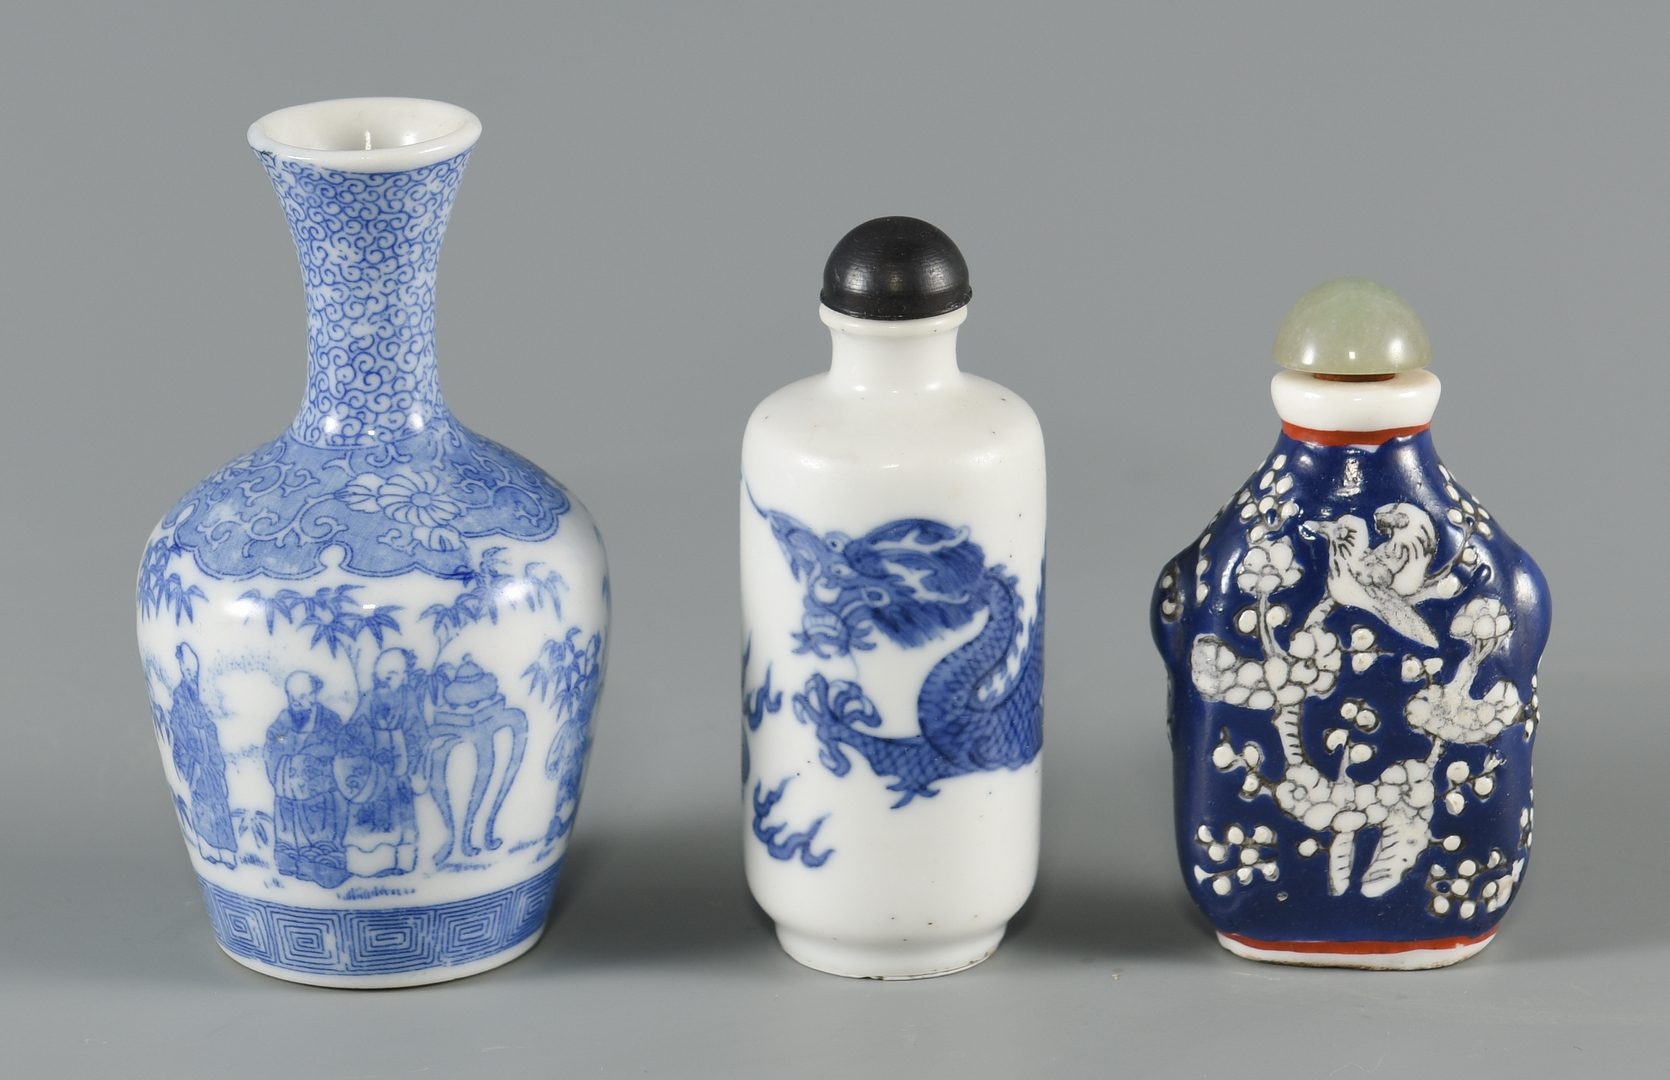 Lot 596: 6 Assorted Asian Porcelain Items